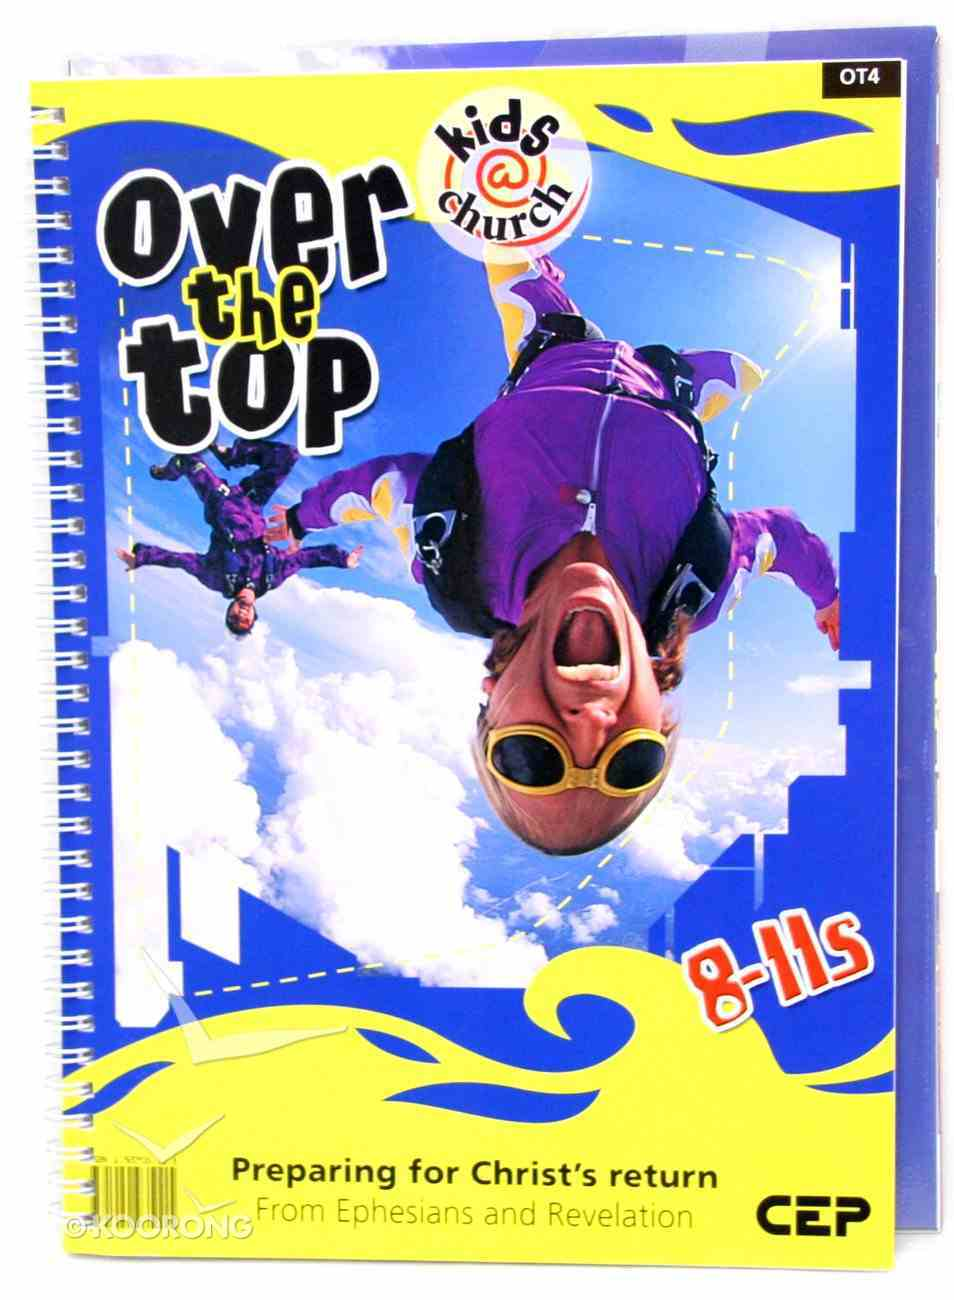 Kids@Church 04: Ot4 Ages 8-11 Teacher's Manual (Over the Top) (Kids@church Curriculum Series) Spiral